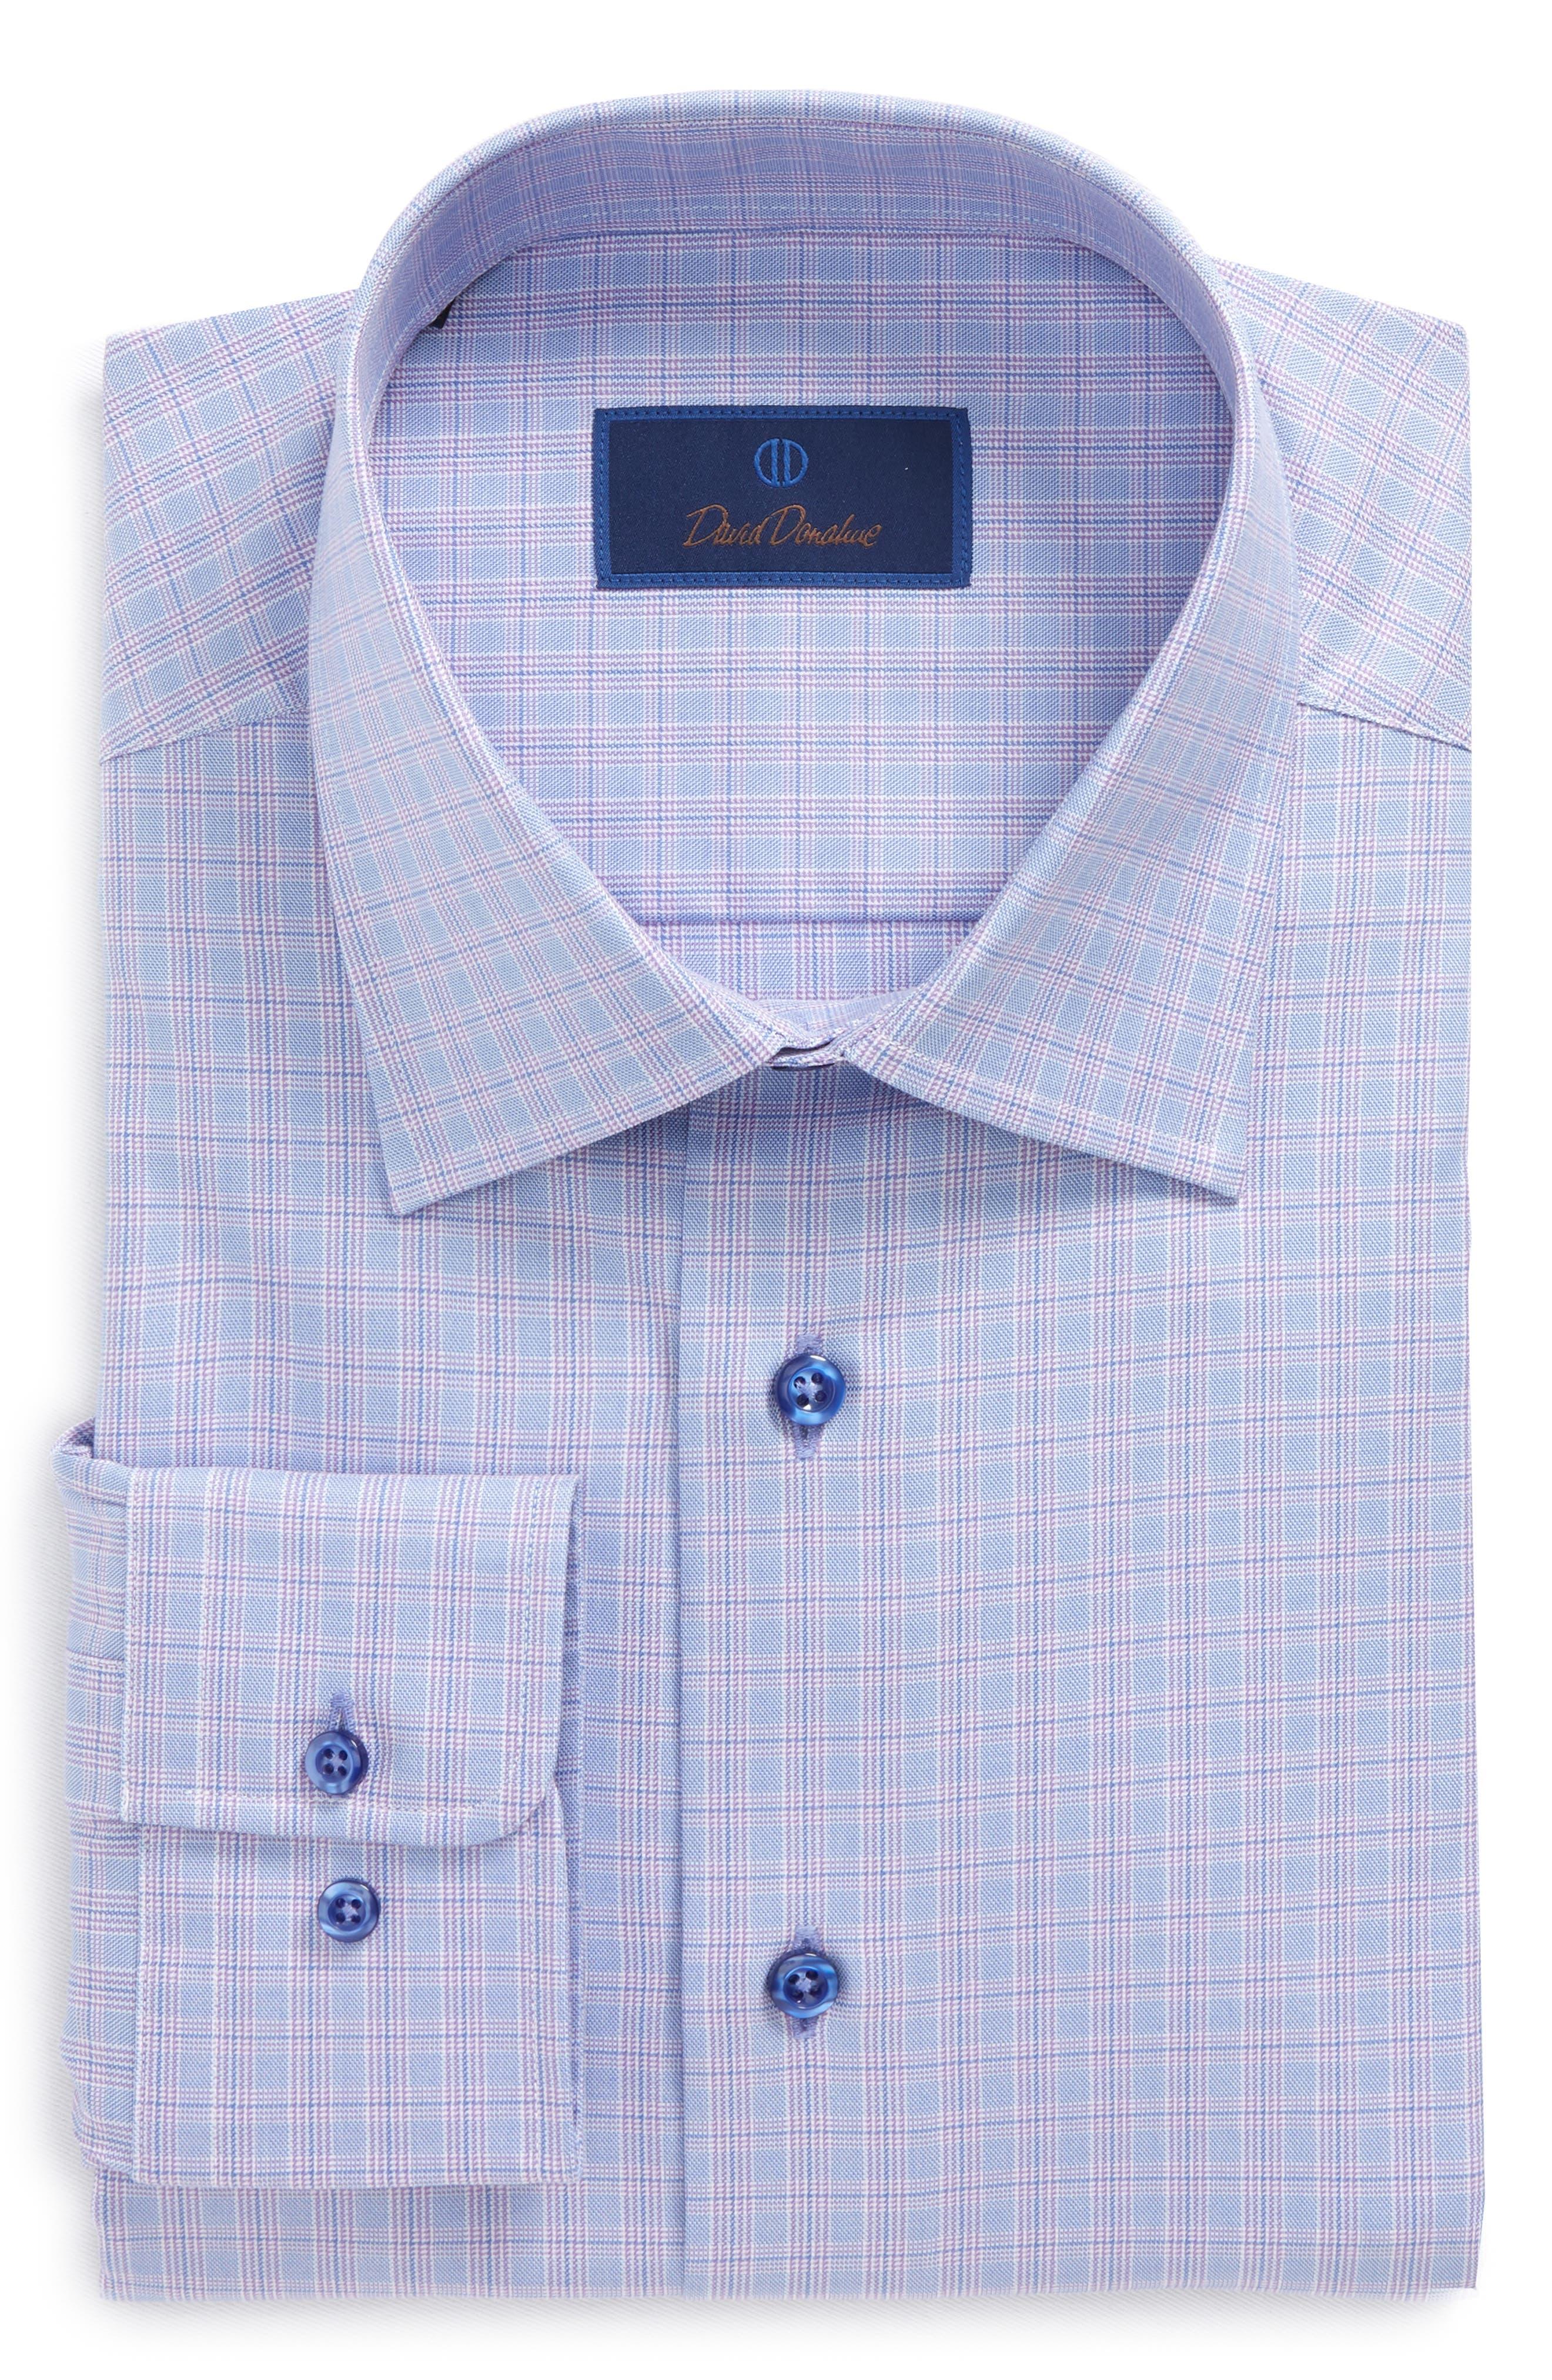 Regular Fit Plaid Dress Shirt,                         Main,                         color, Lilac